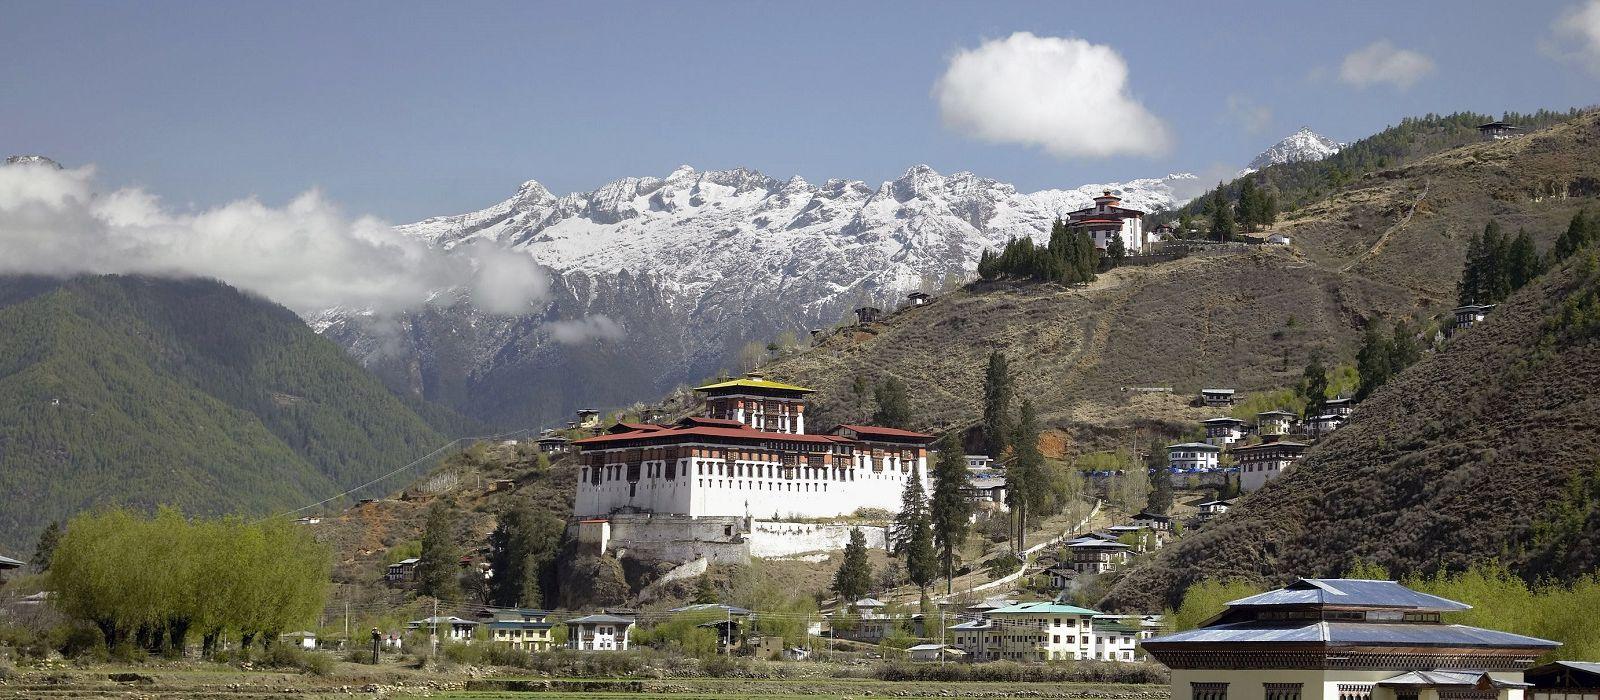 Amankora Exklusivangebot: Luxuriöses Bhutan Urlaub 6